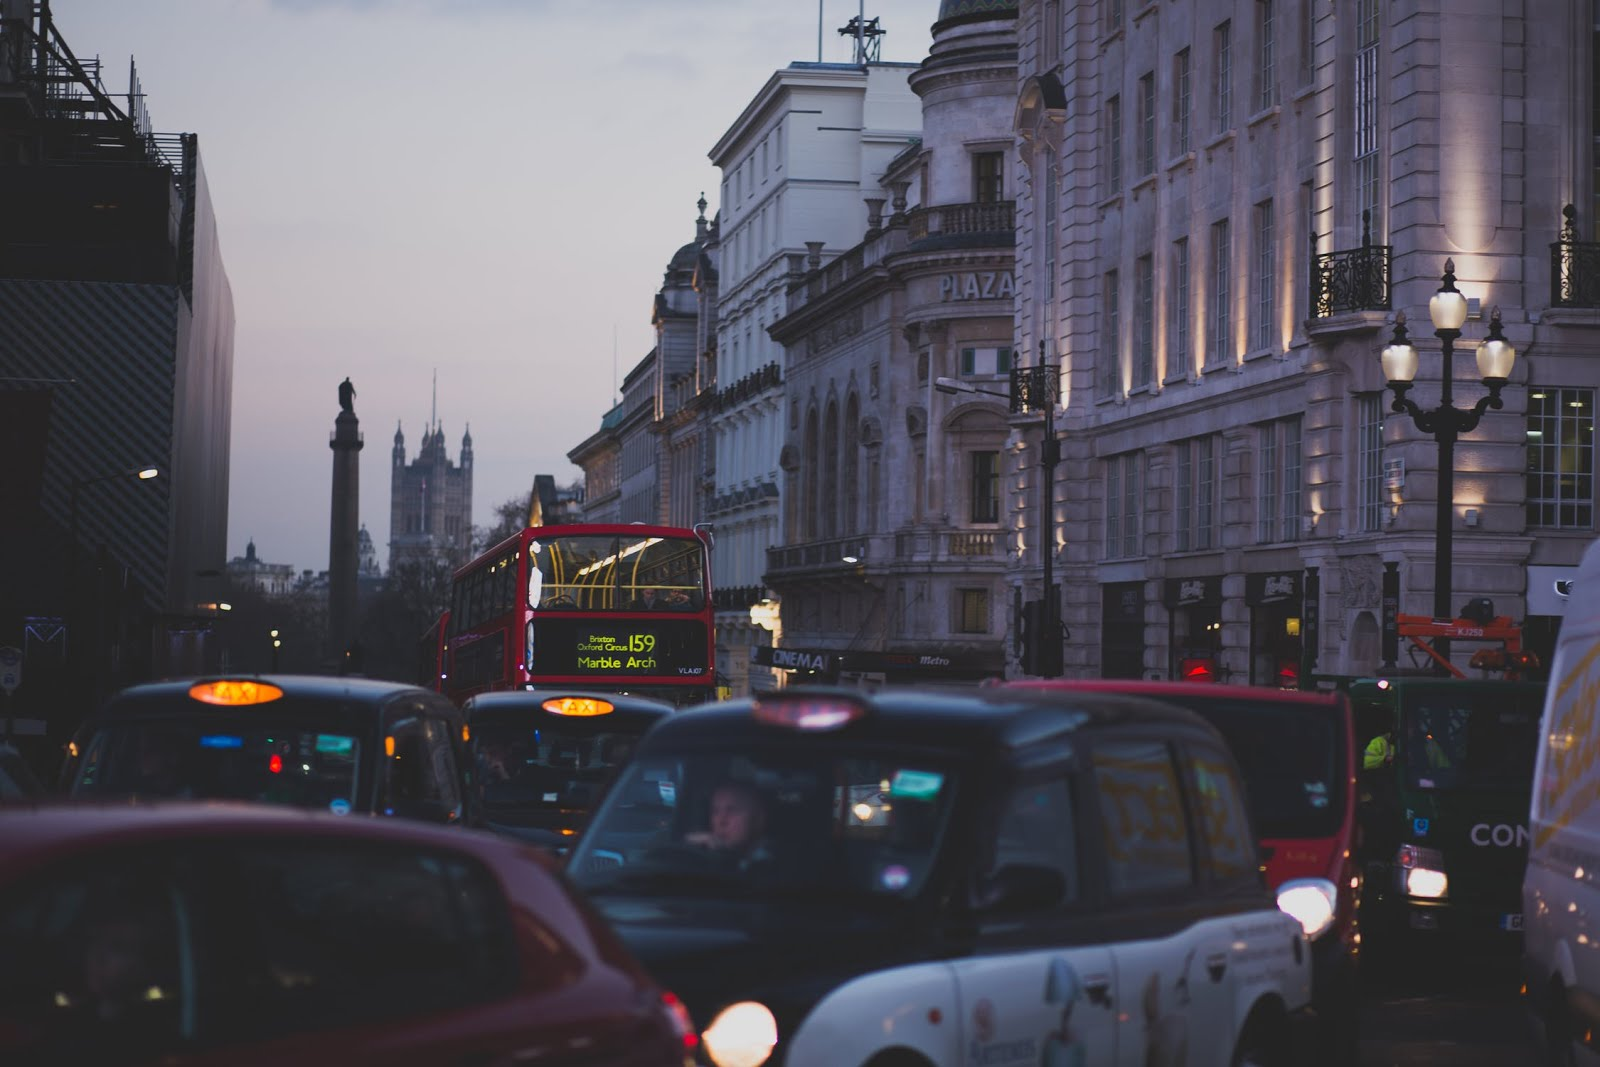 london trip planning travel uk united kingdom